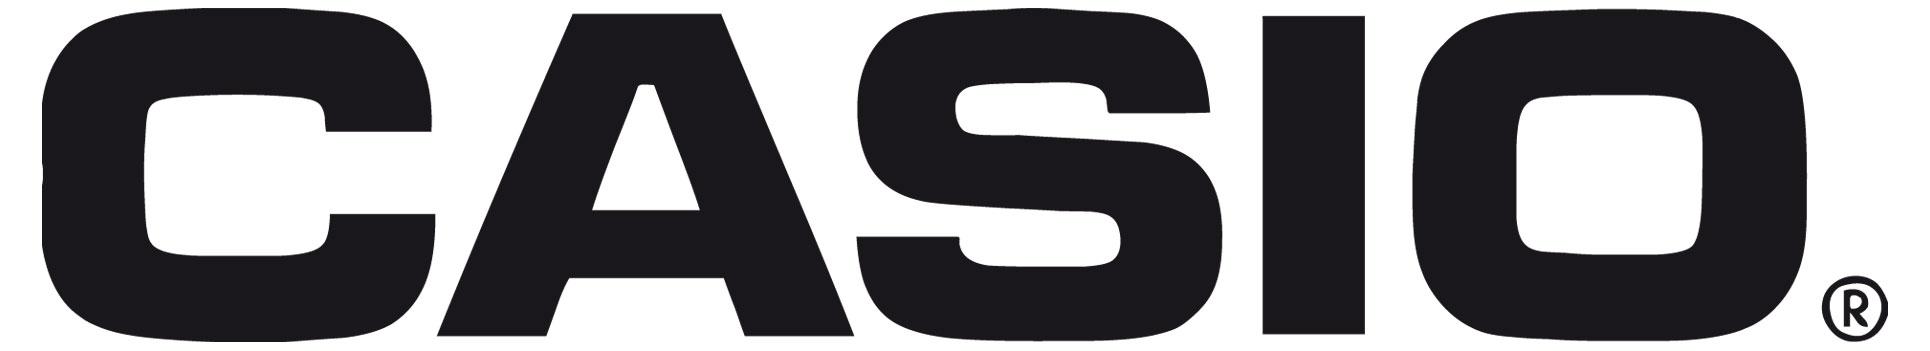 casio-logo-_1.jpg